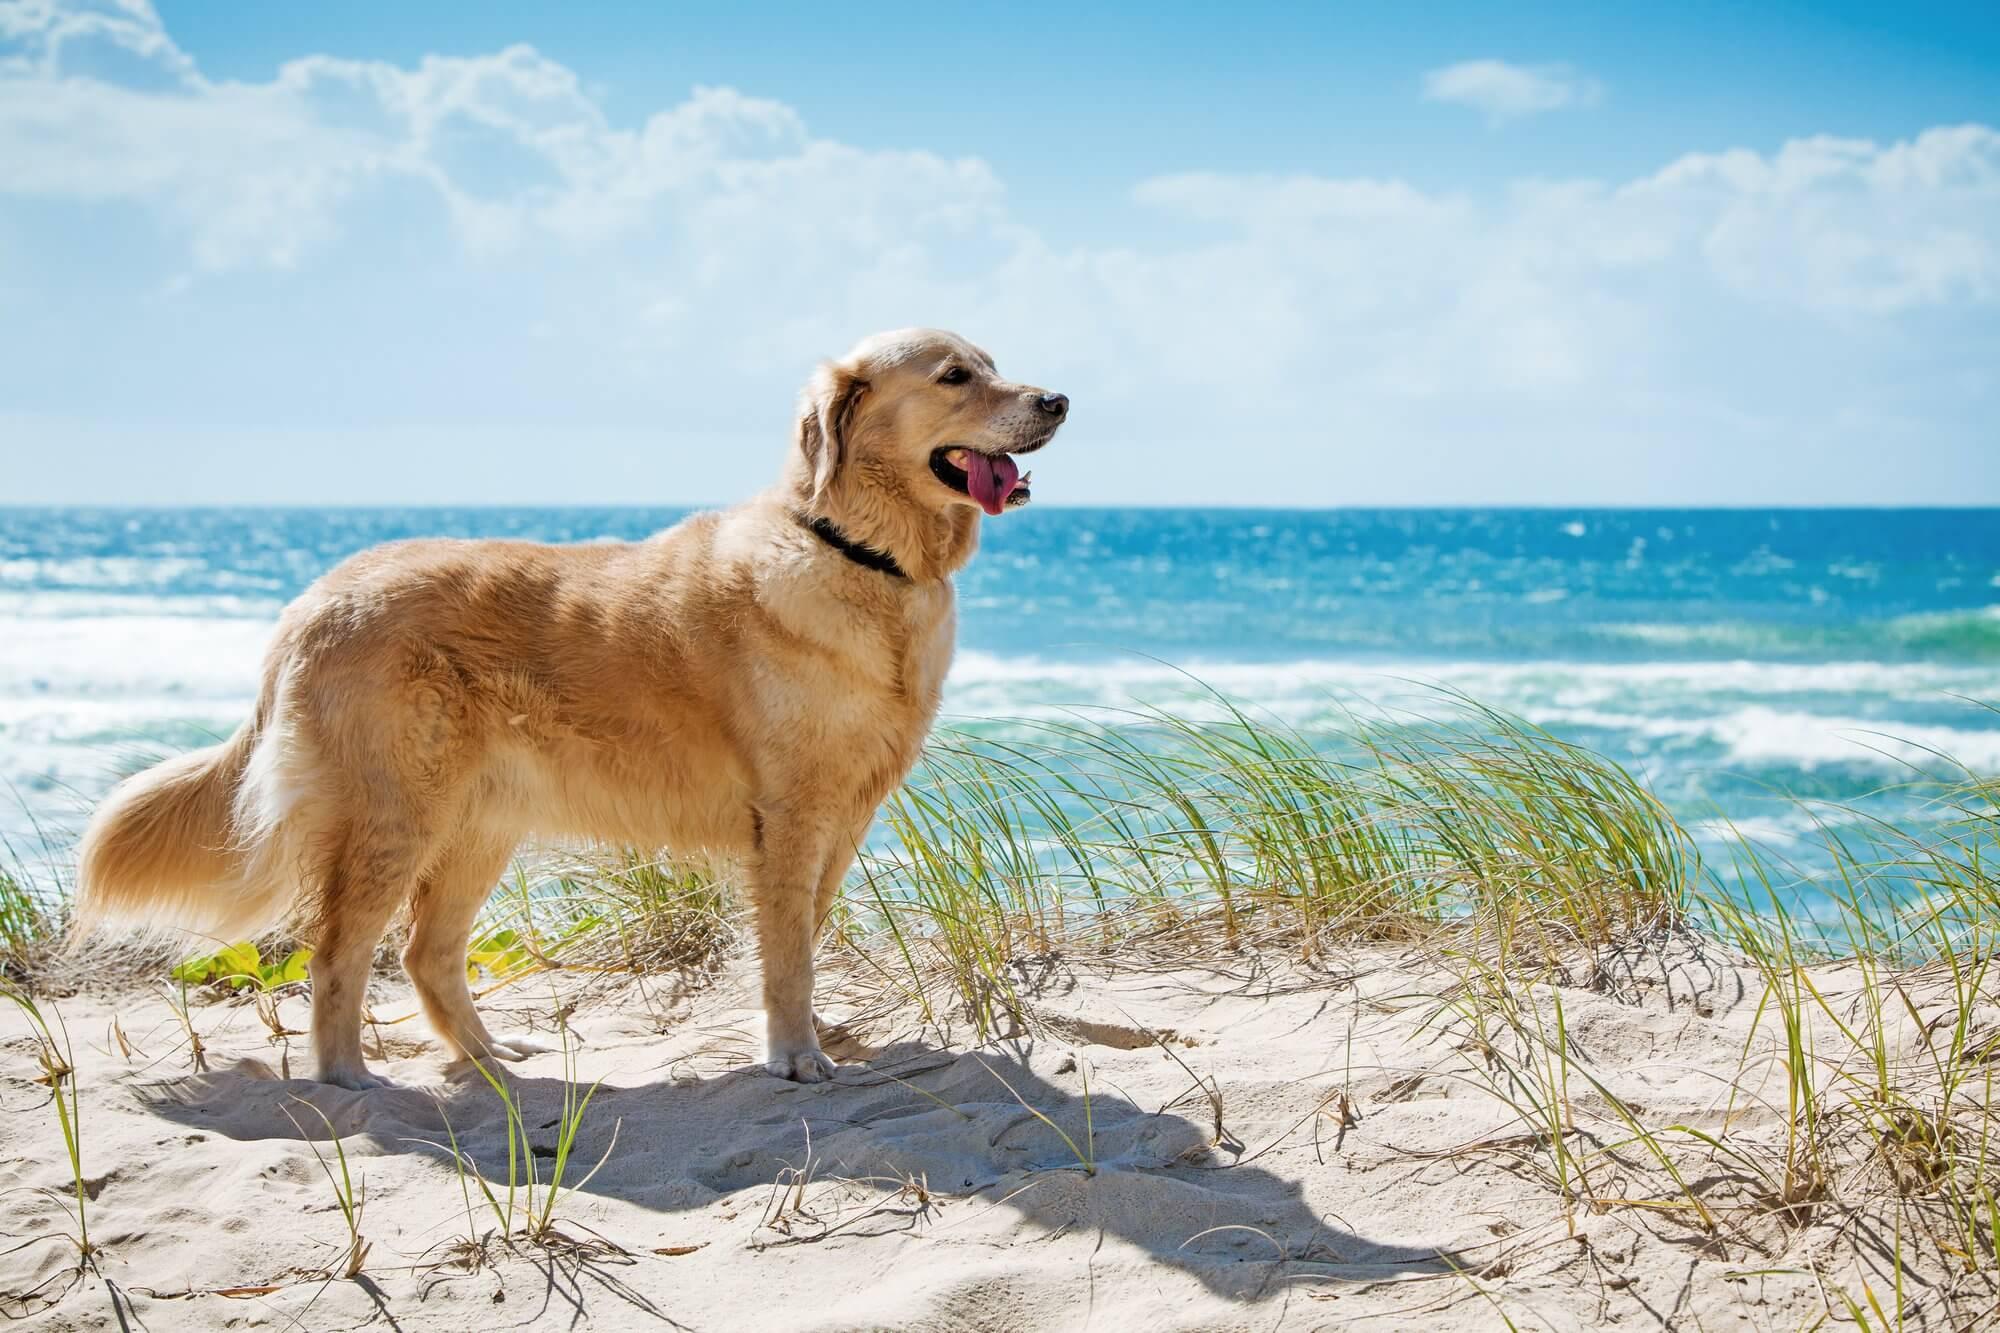 Anjing Golden : Karakter, Variasi Jenis, kelebihan & Harga (Update) 9